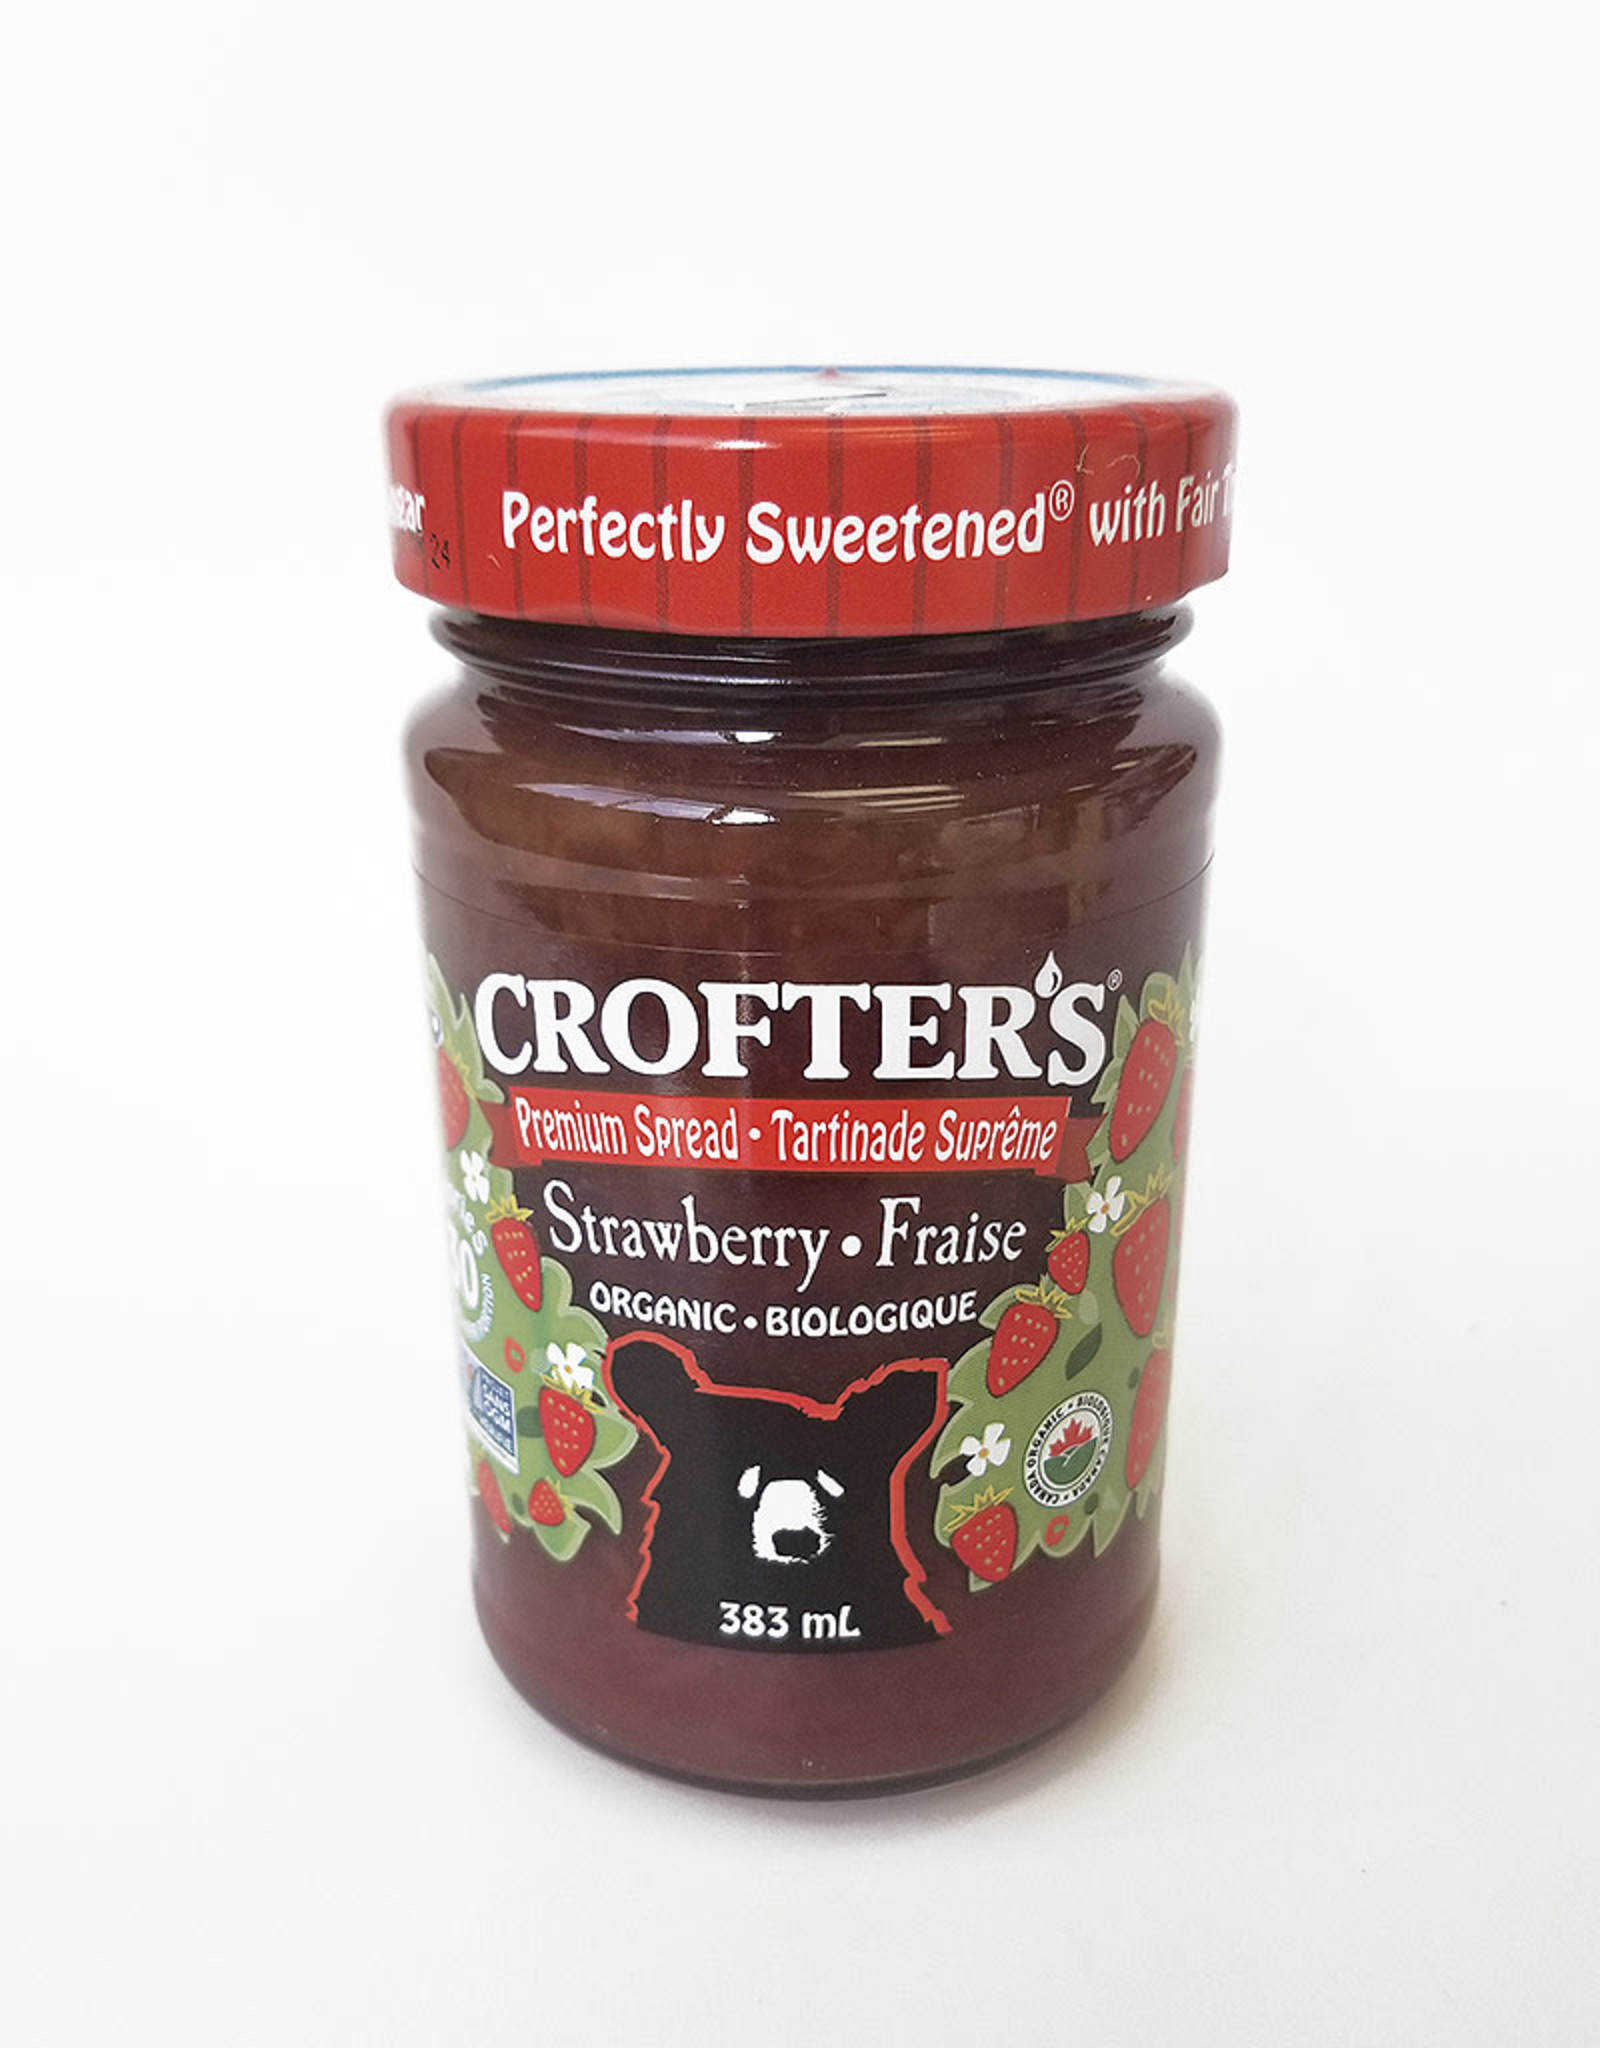 Crofter's Organic Crofters Organic - Fruit Spread, Strawberry (383ml)